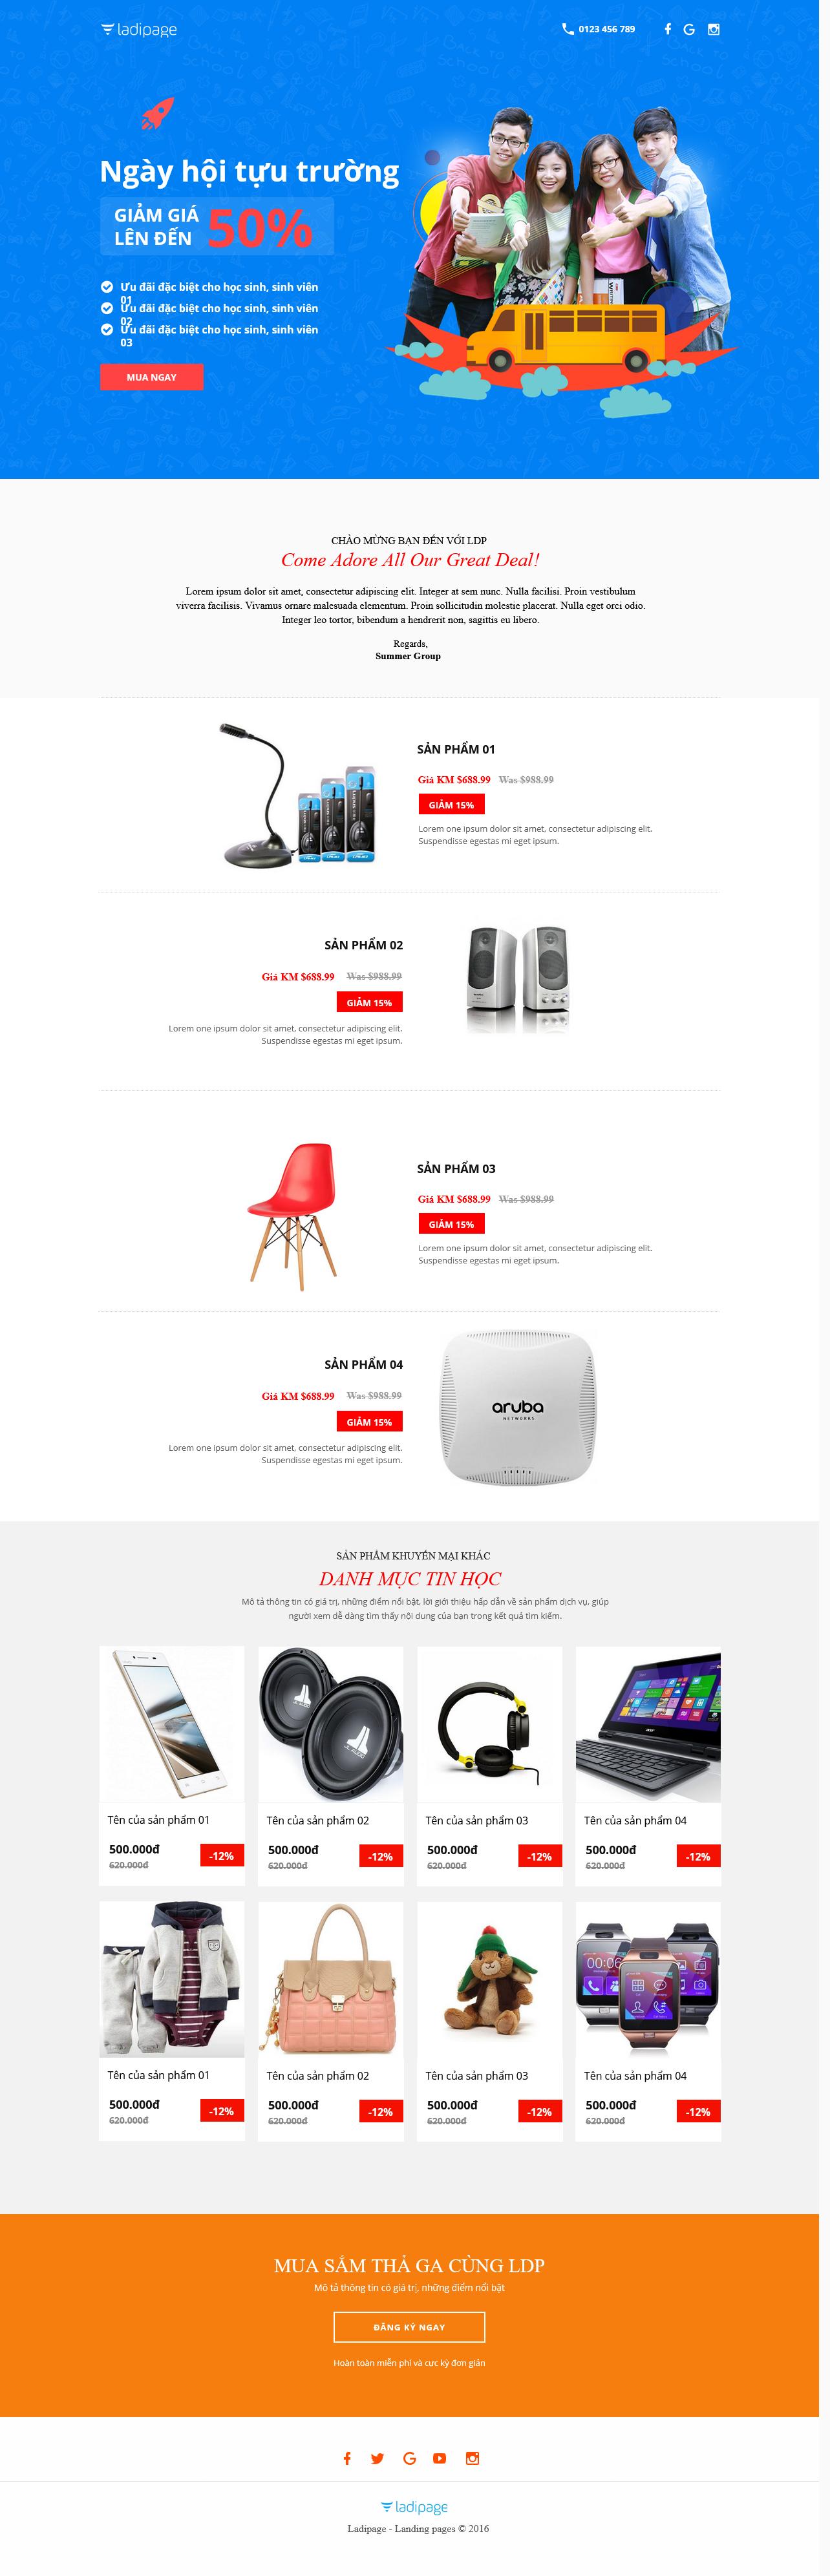 Thiết kế website Thiết kế webiste landingpage giveaway-landing-page Khuyến mại 03